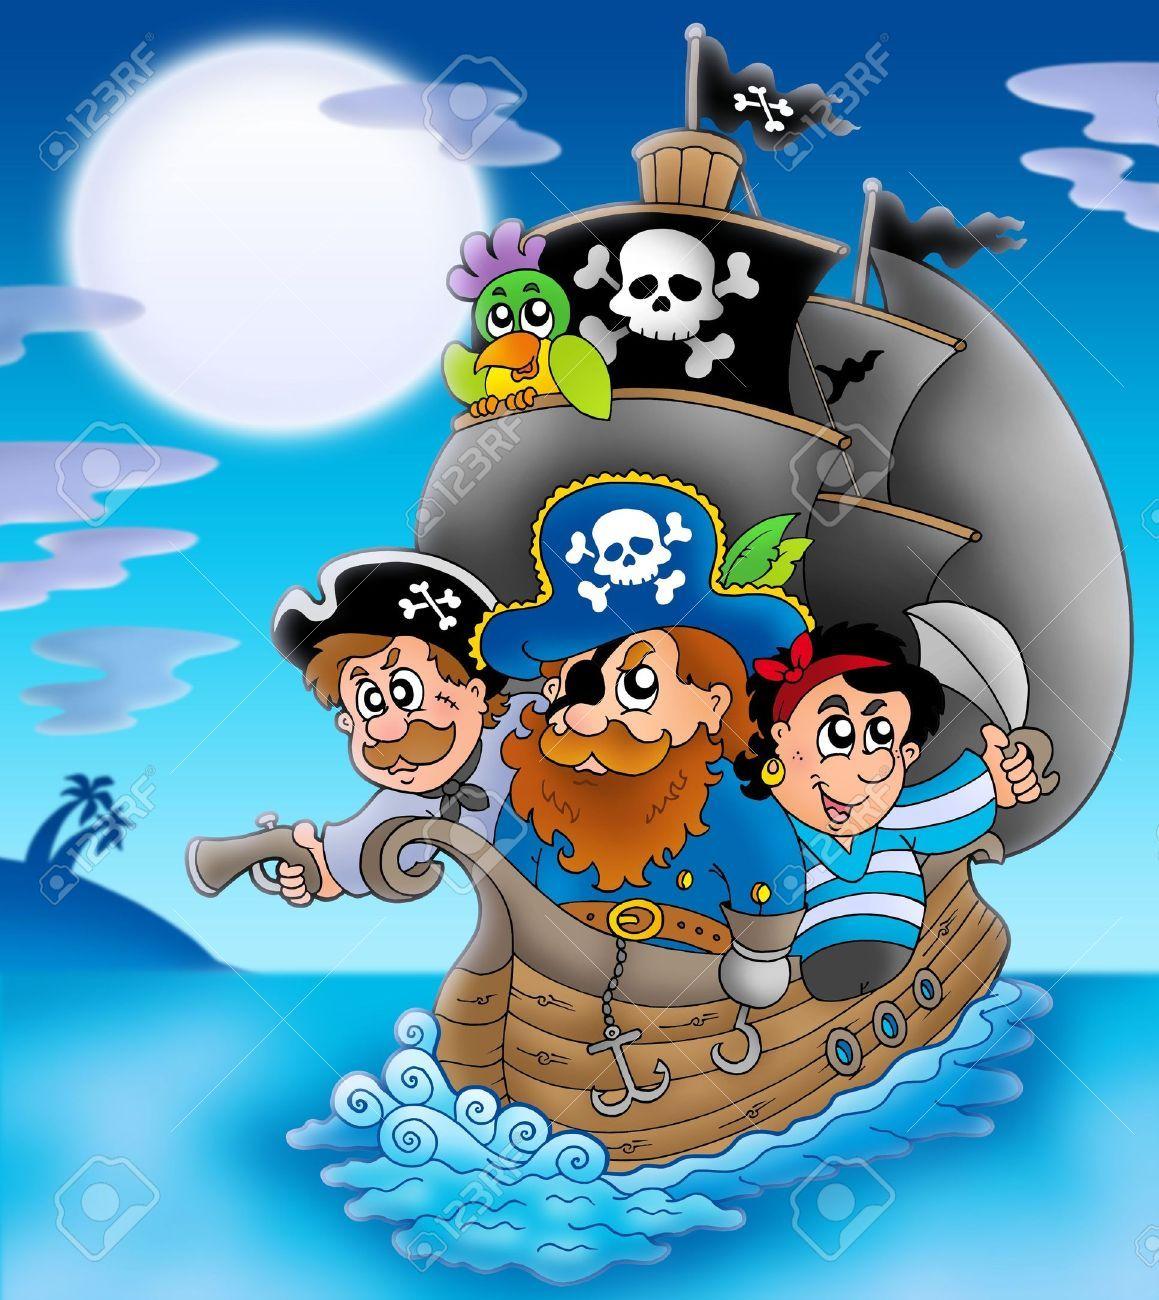 Velero con piratas de dibujos animados. | piratas | Pinterest ...